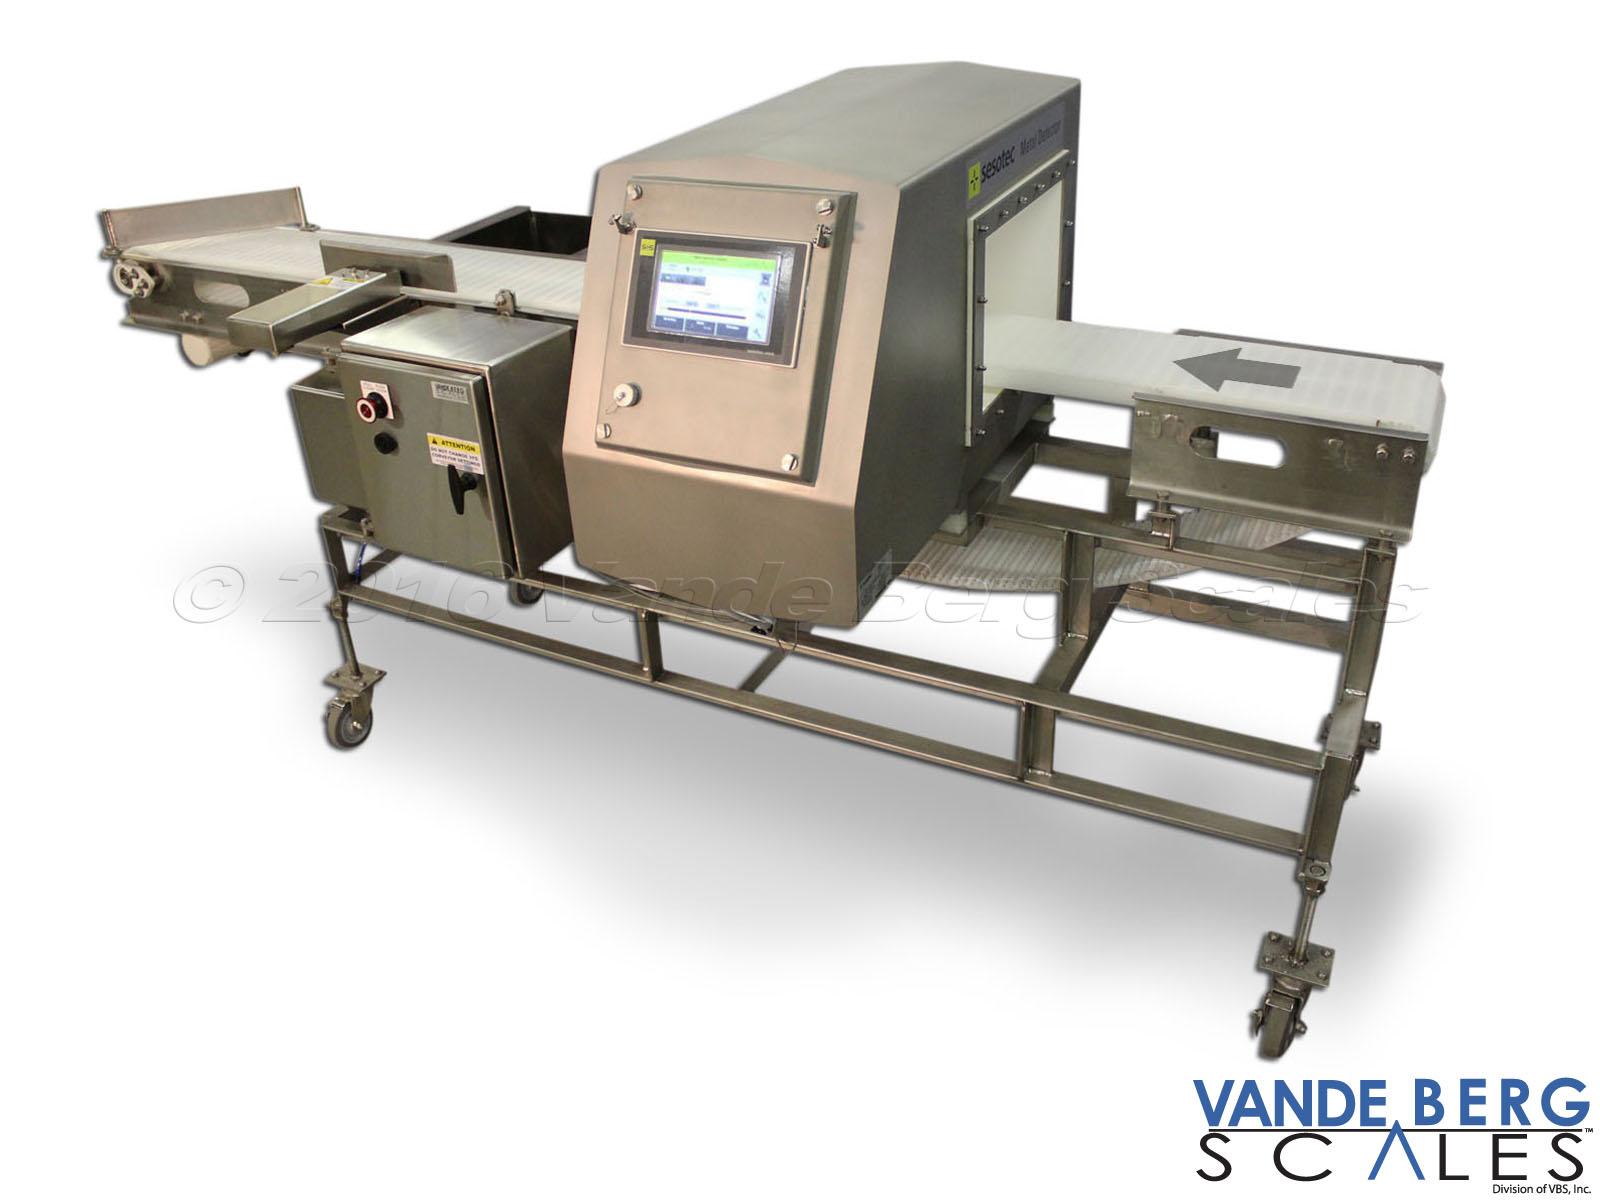 metal detector with divert metal detectors for food processing lines